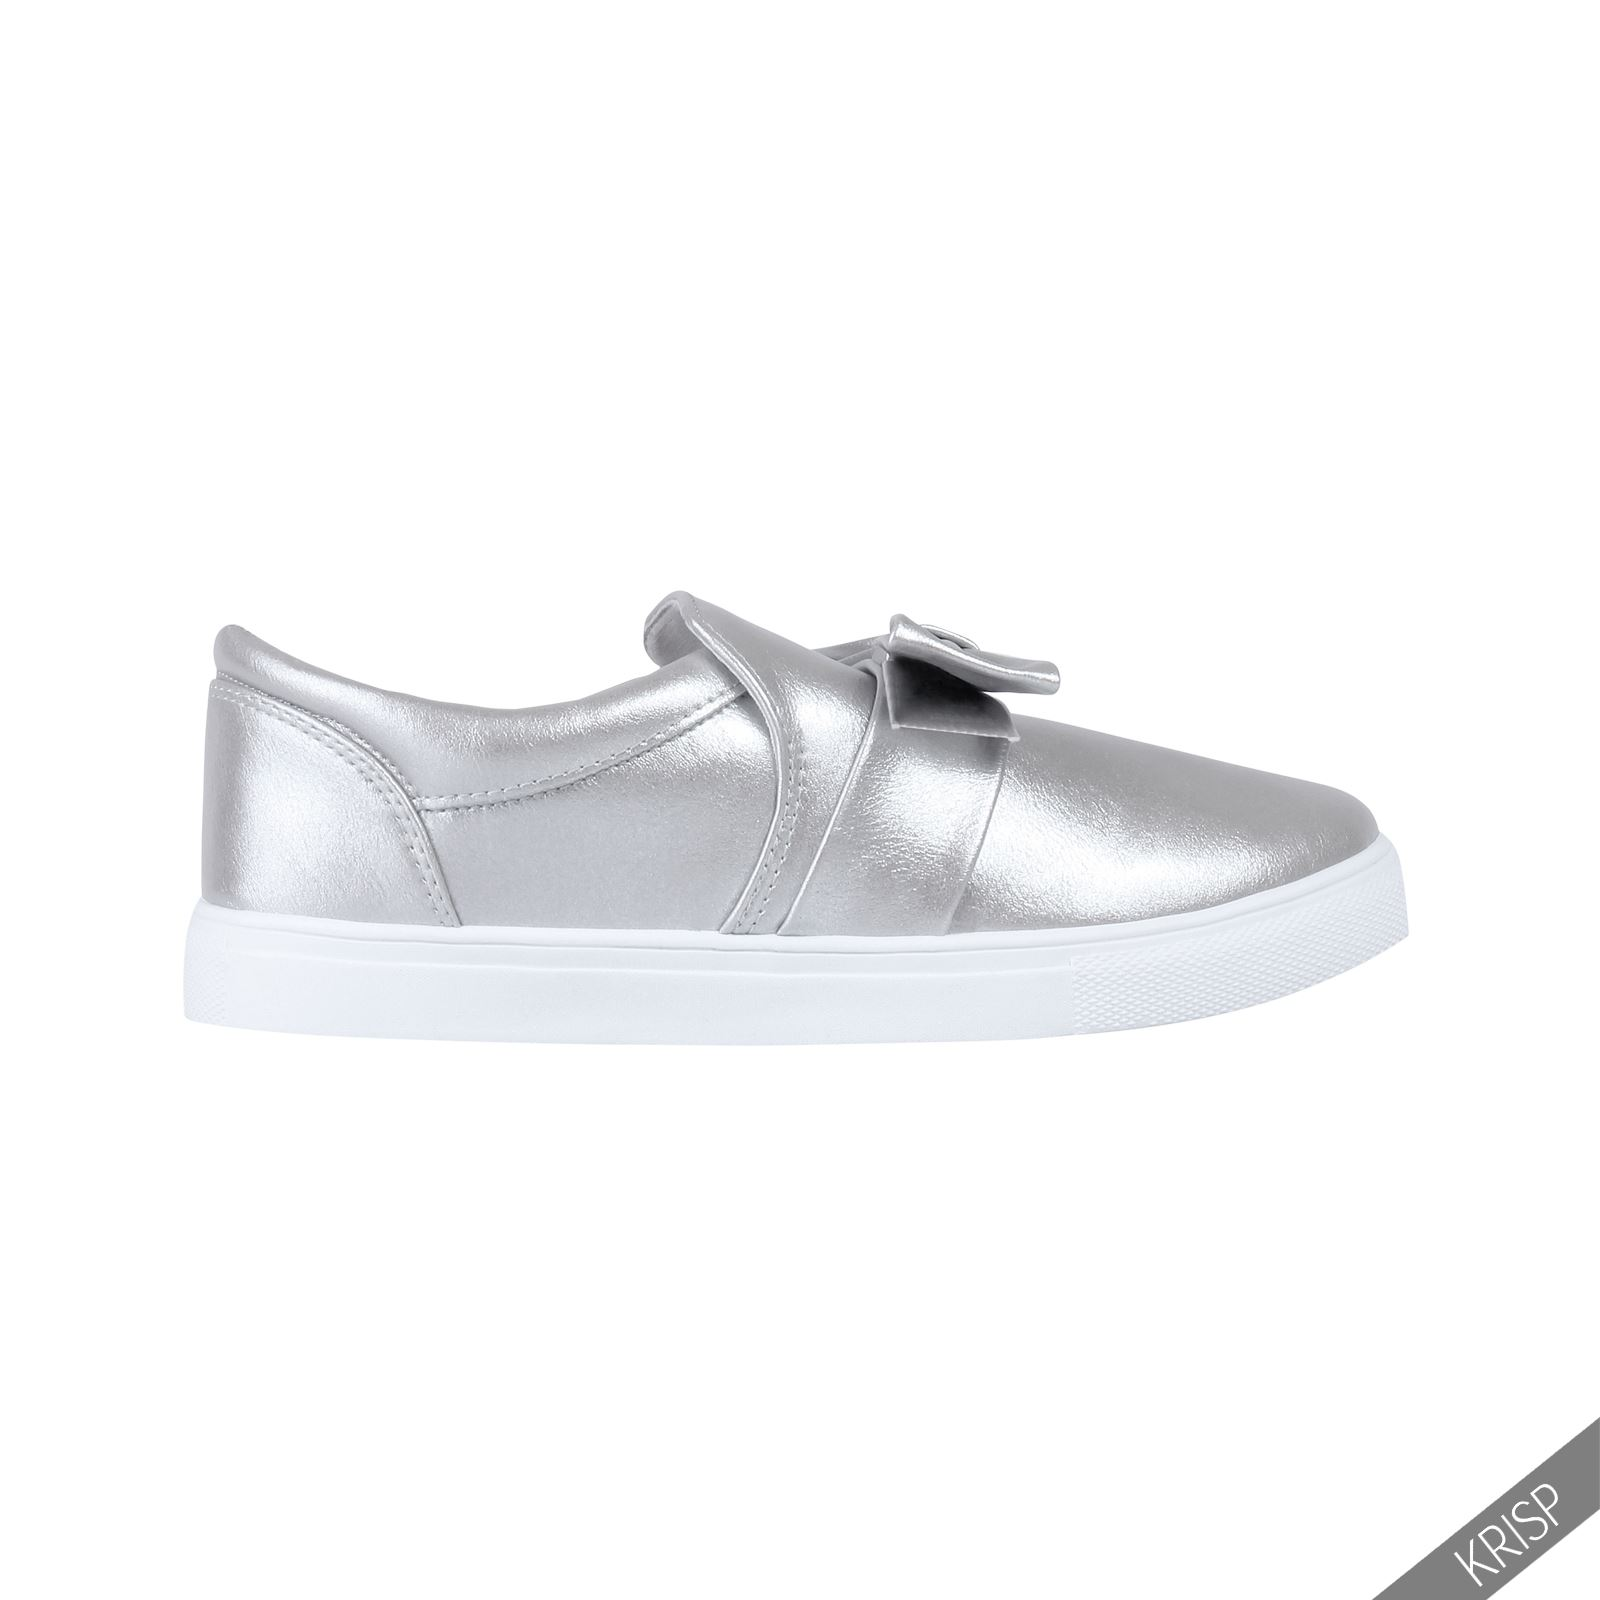 Damen Frauen Jeans Denim Stoff Schuhe Schleife Breite Sohle Sneaker Halbschuhe